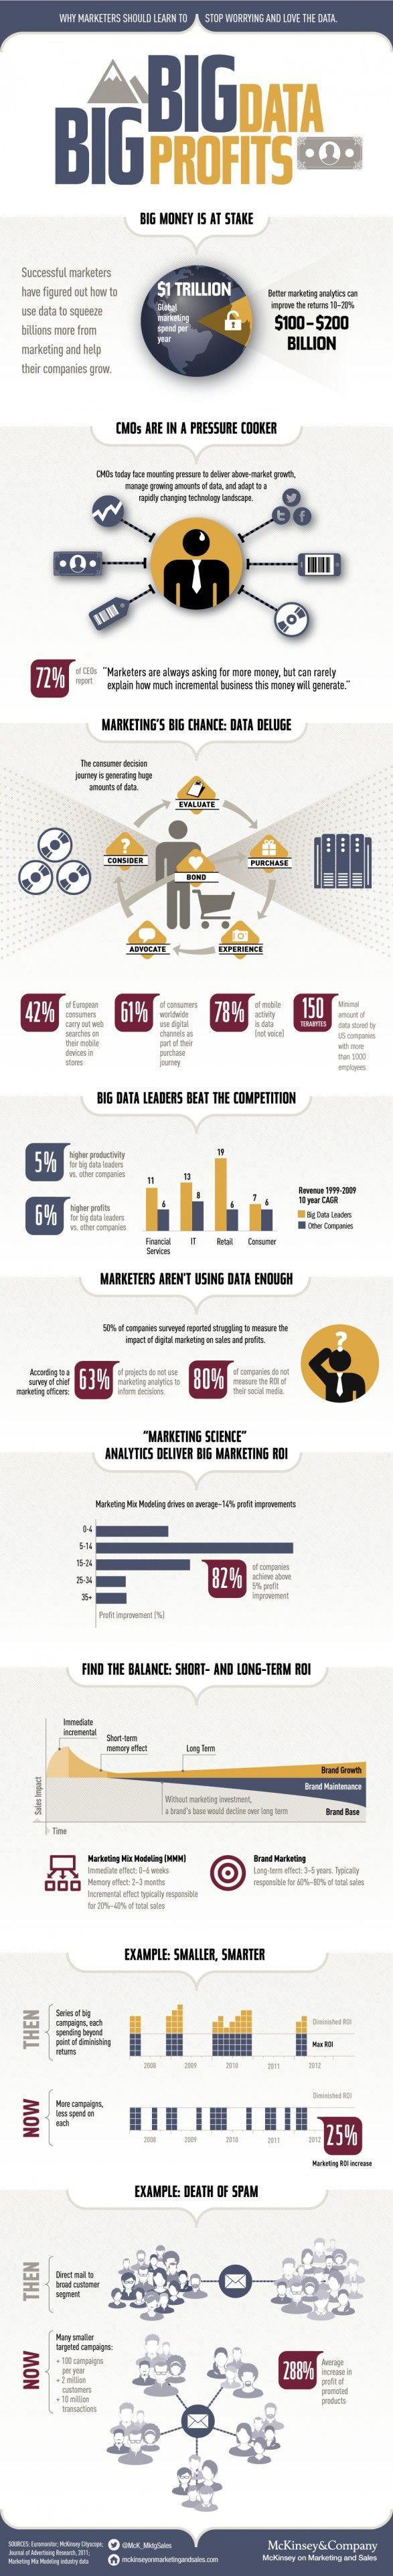 [Cool Infographic Friday] Big Data Big Profits